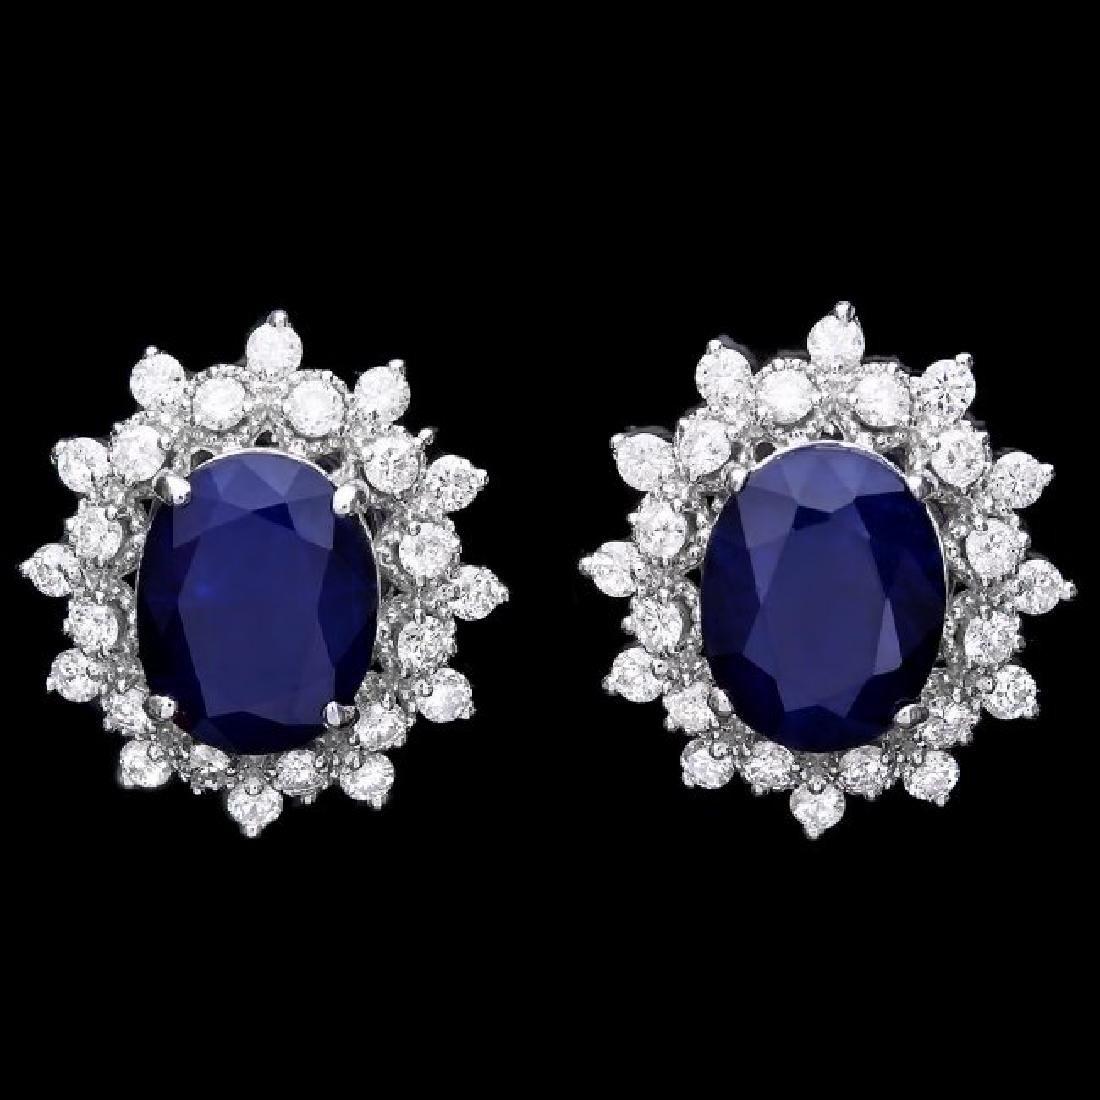 14k Gold 7ct Sapphire 1.25ct Diamond Earrings